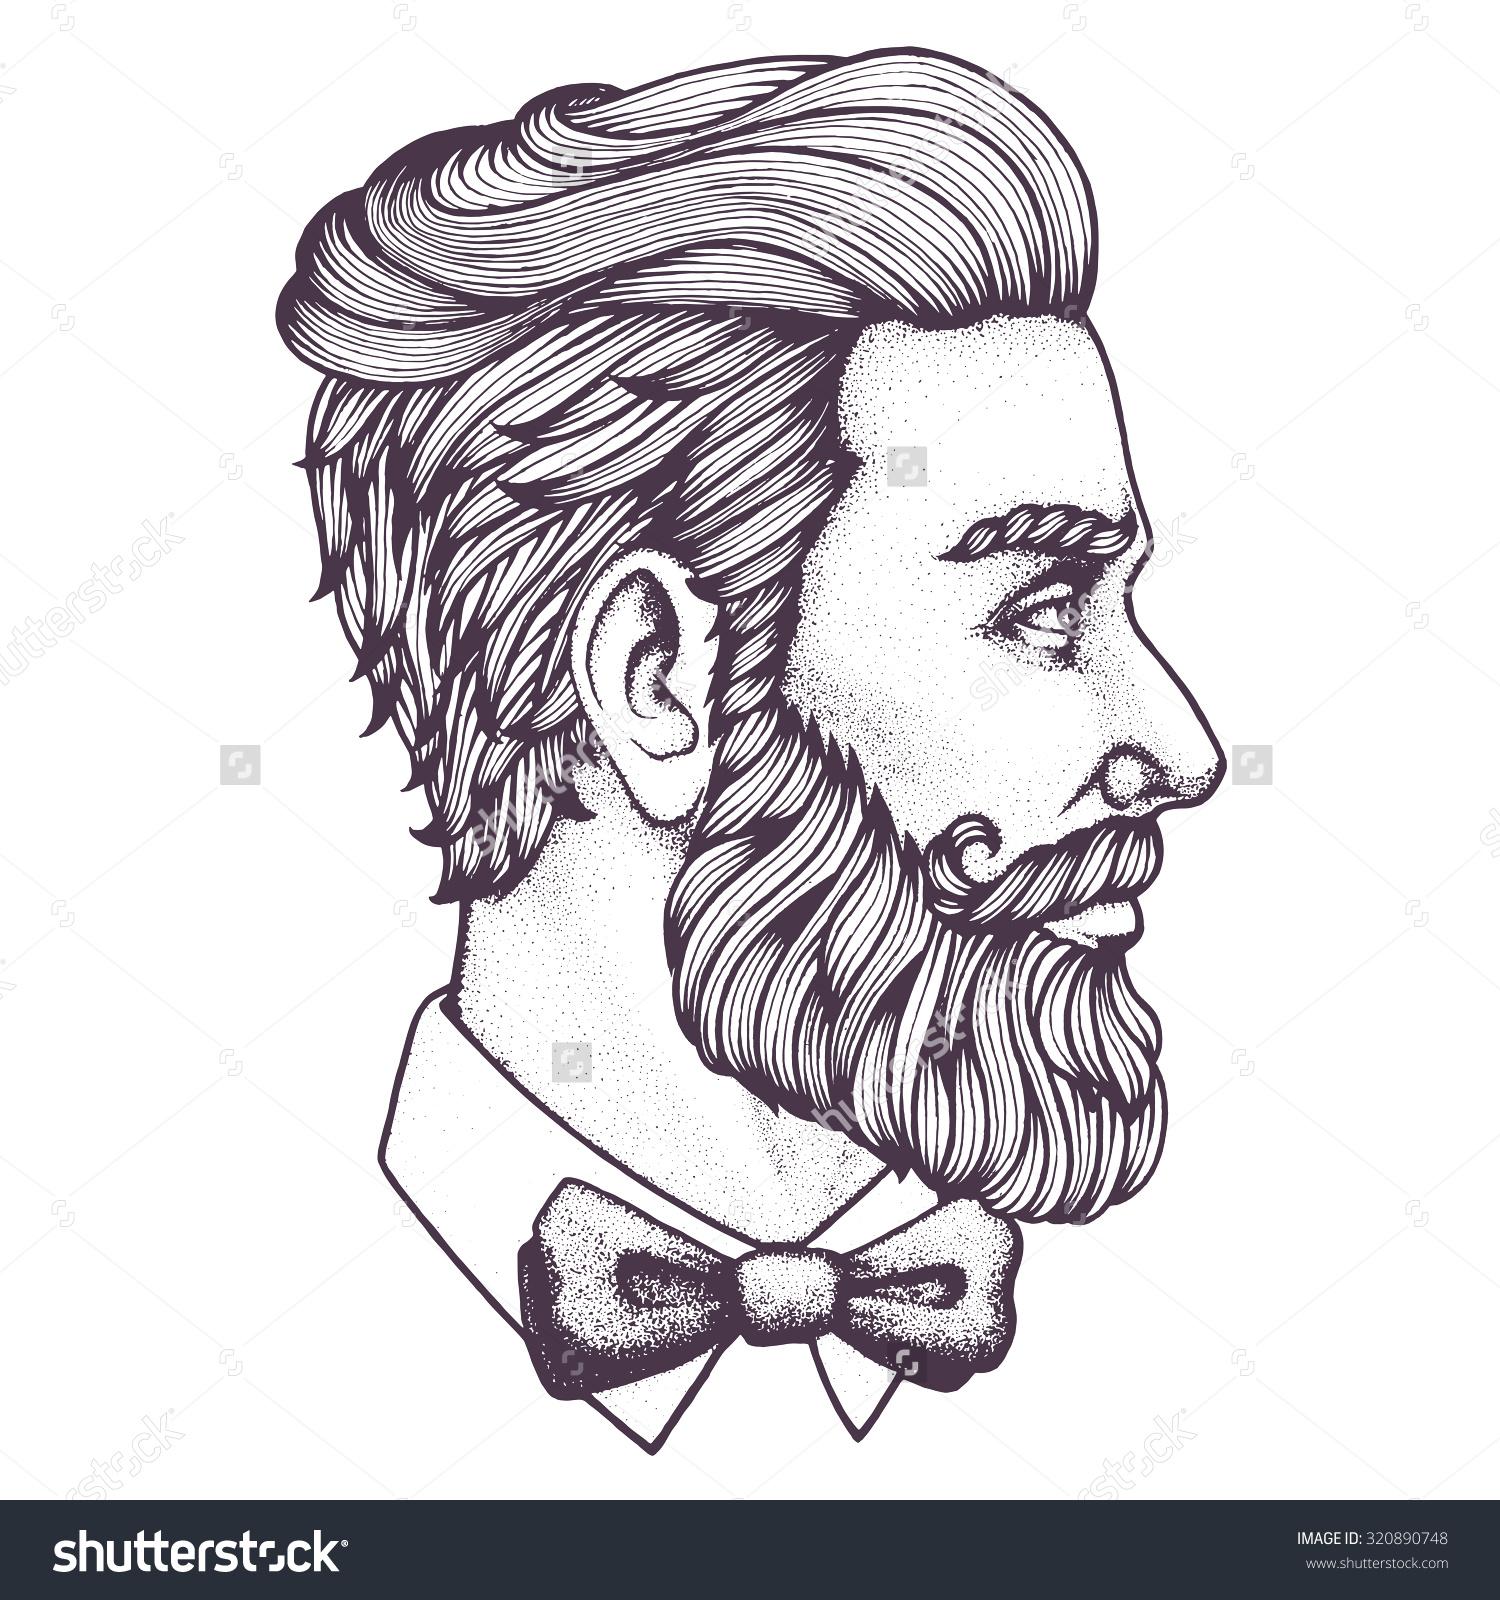 Drawn beard Of Hand  illustration man